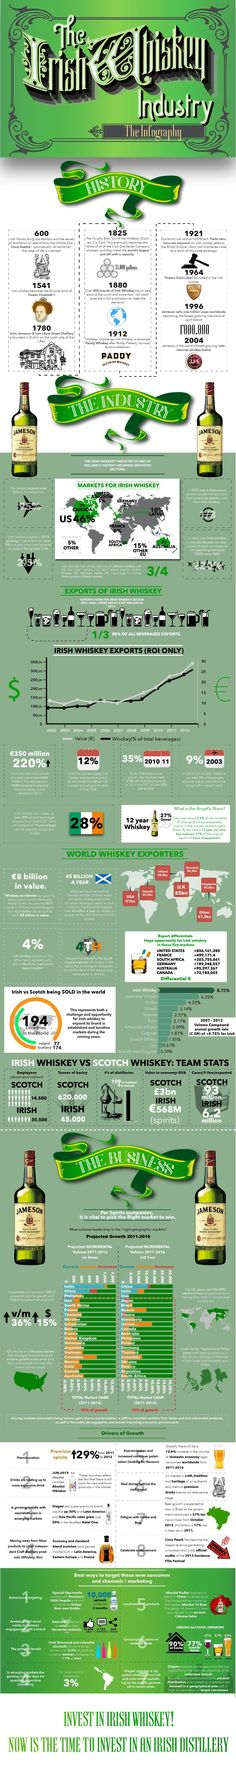 The Irish Whiskey Infographic #whiskydrinks